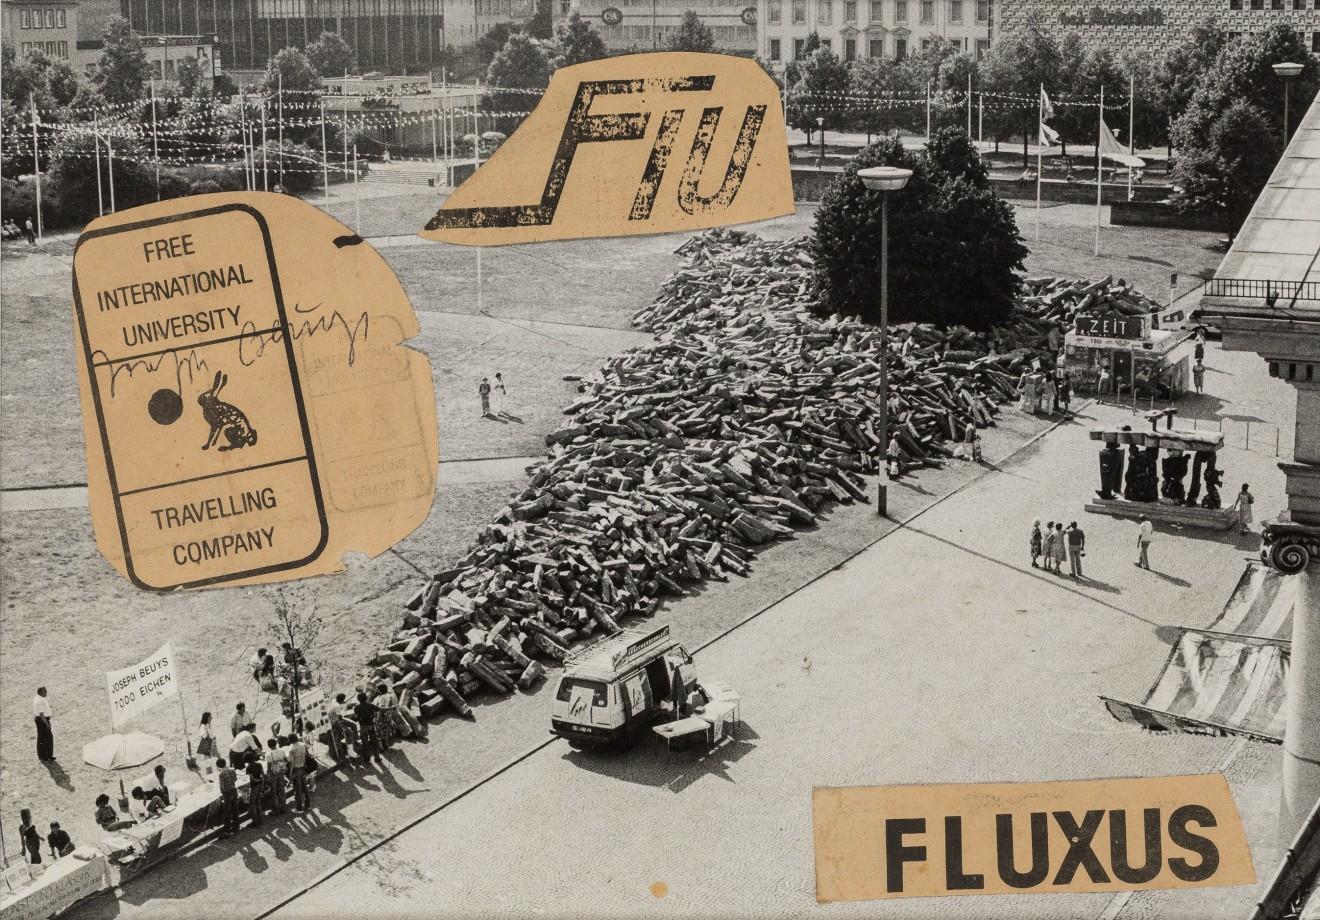 JOSEPH BEUYS, Fluxus (7,000 Oaks), c. 1982